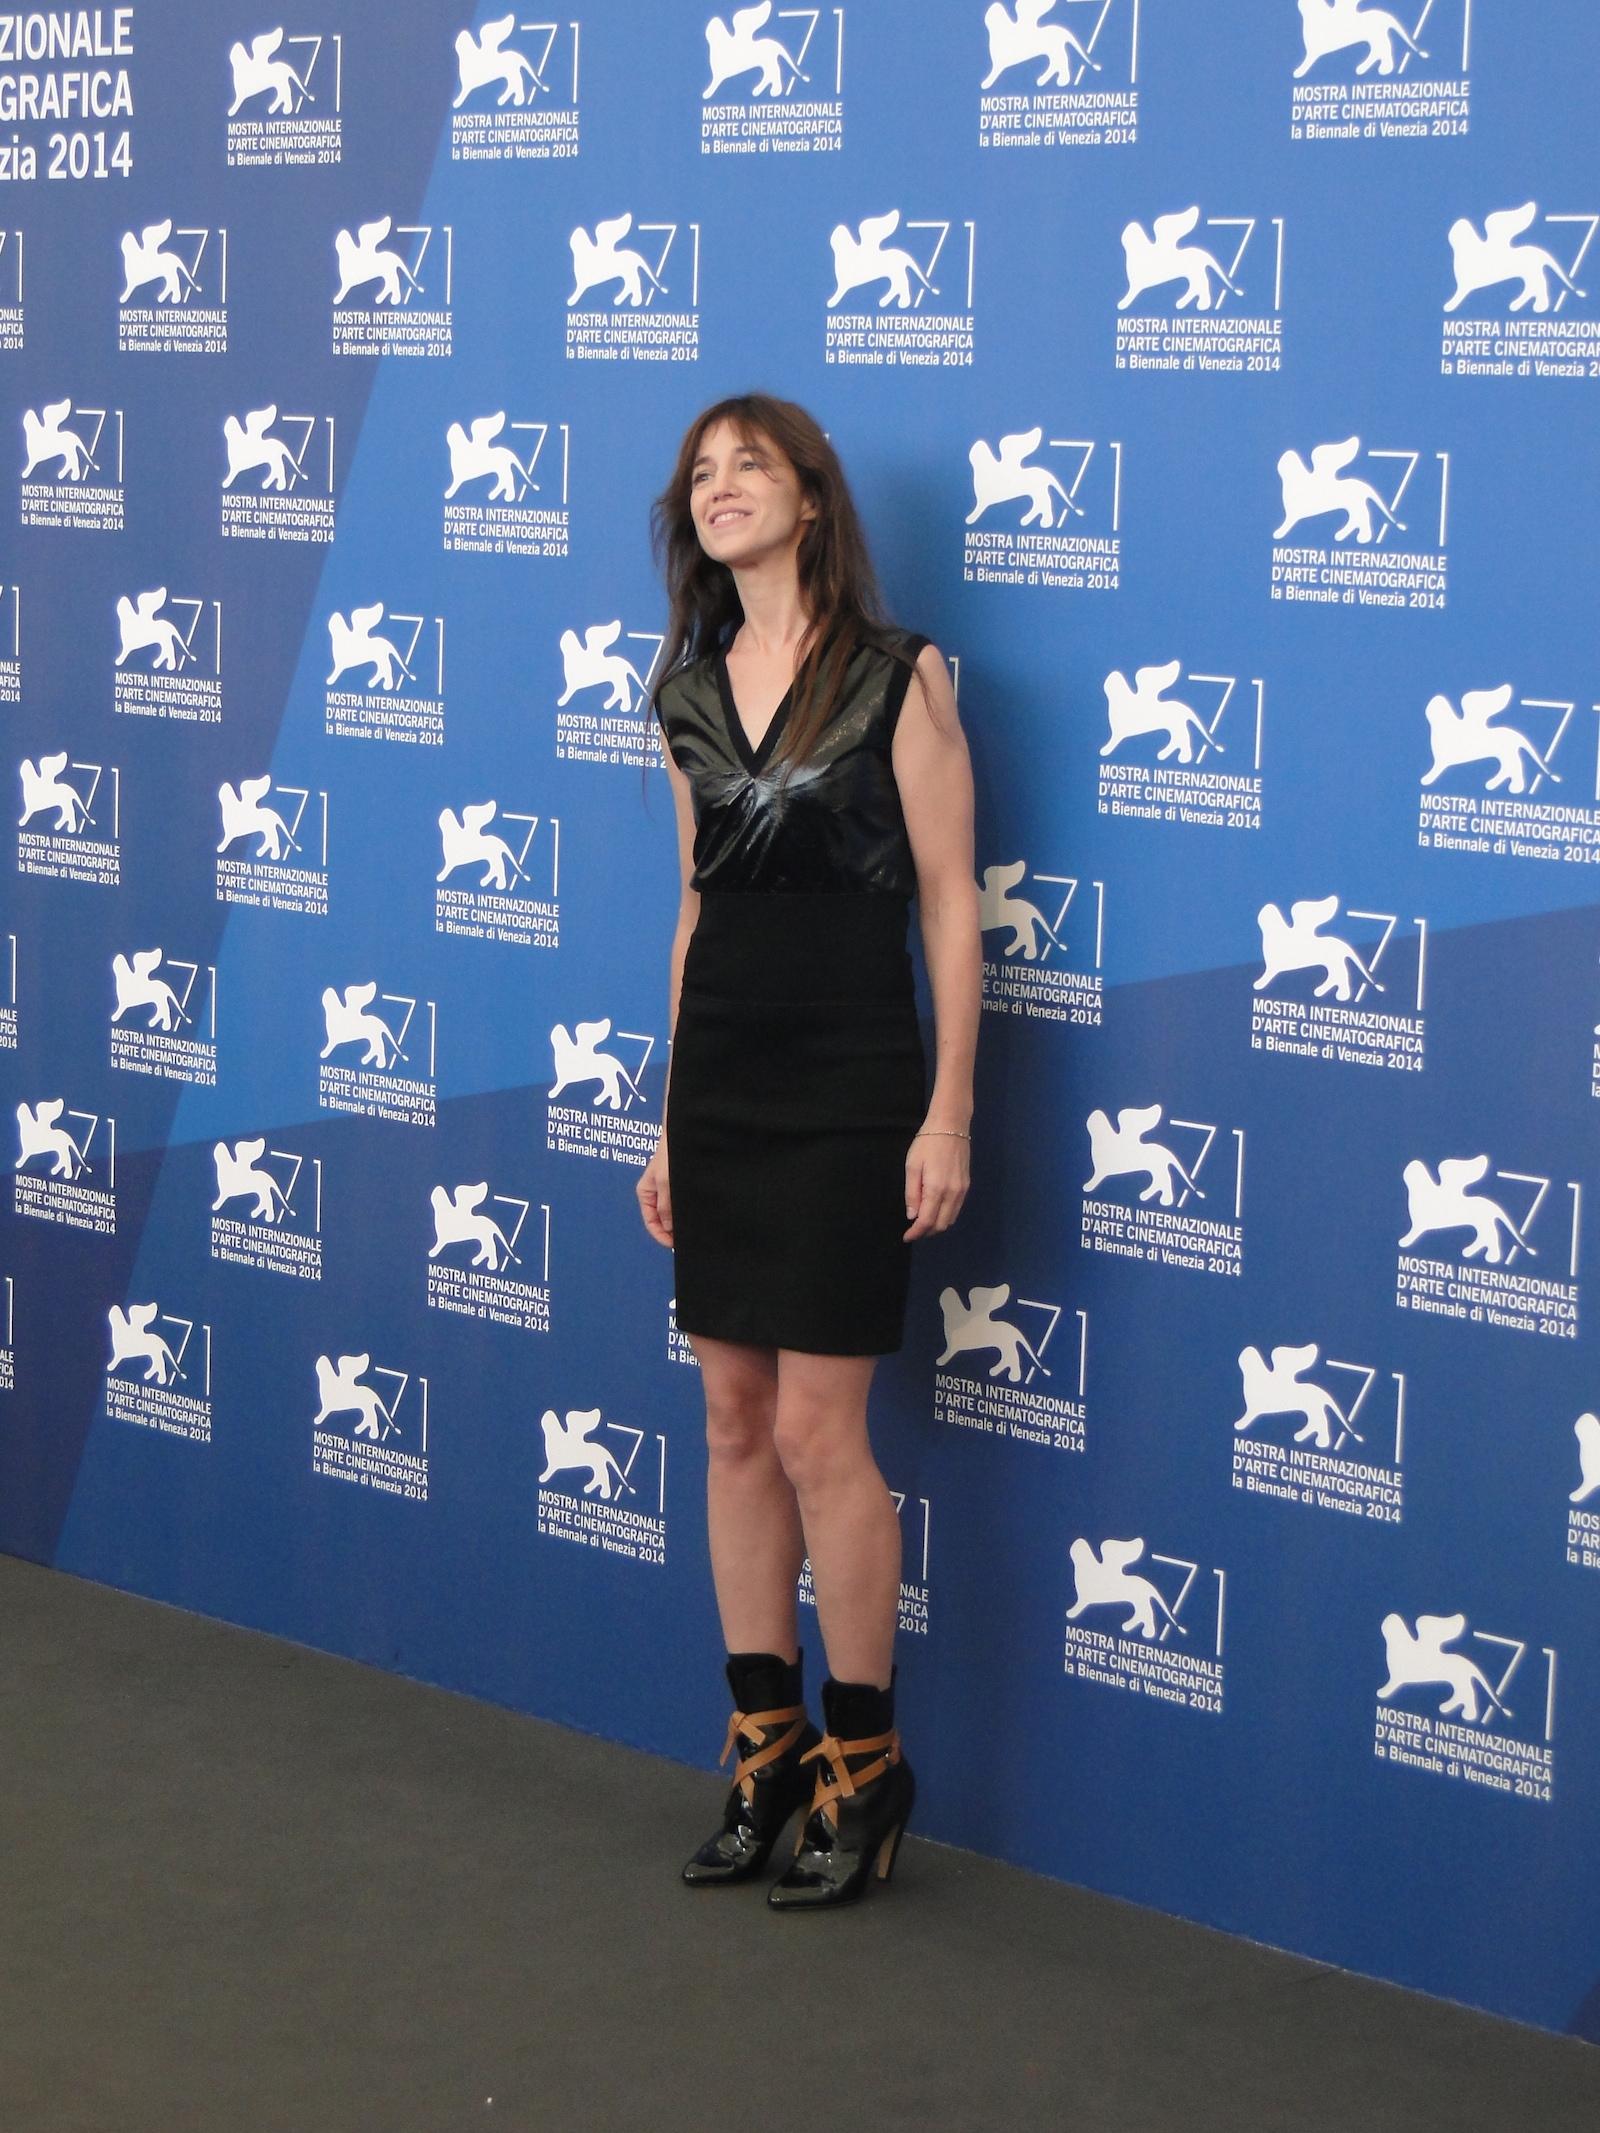 Nymphomaniac Volume II: Charlotte Gainsbourg al photocall di Venezia 2014